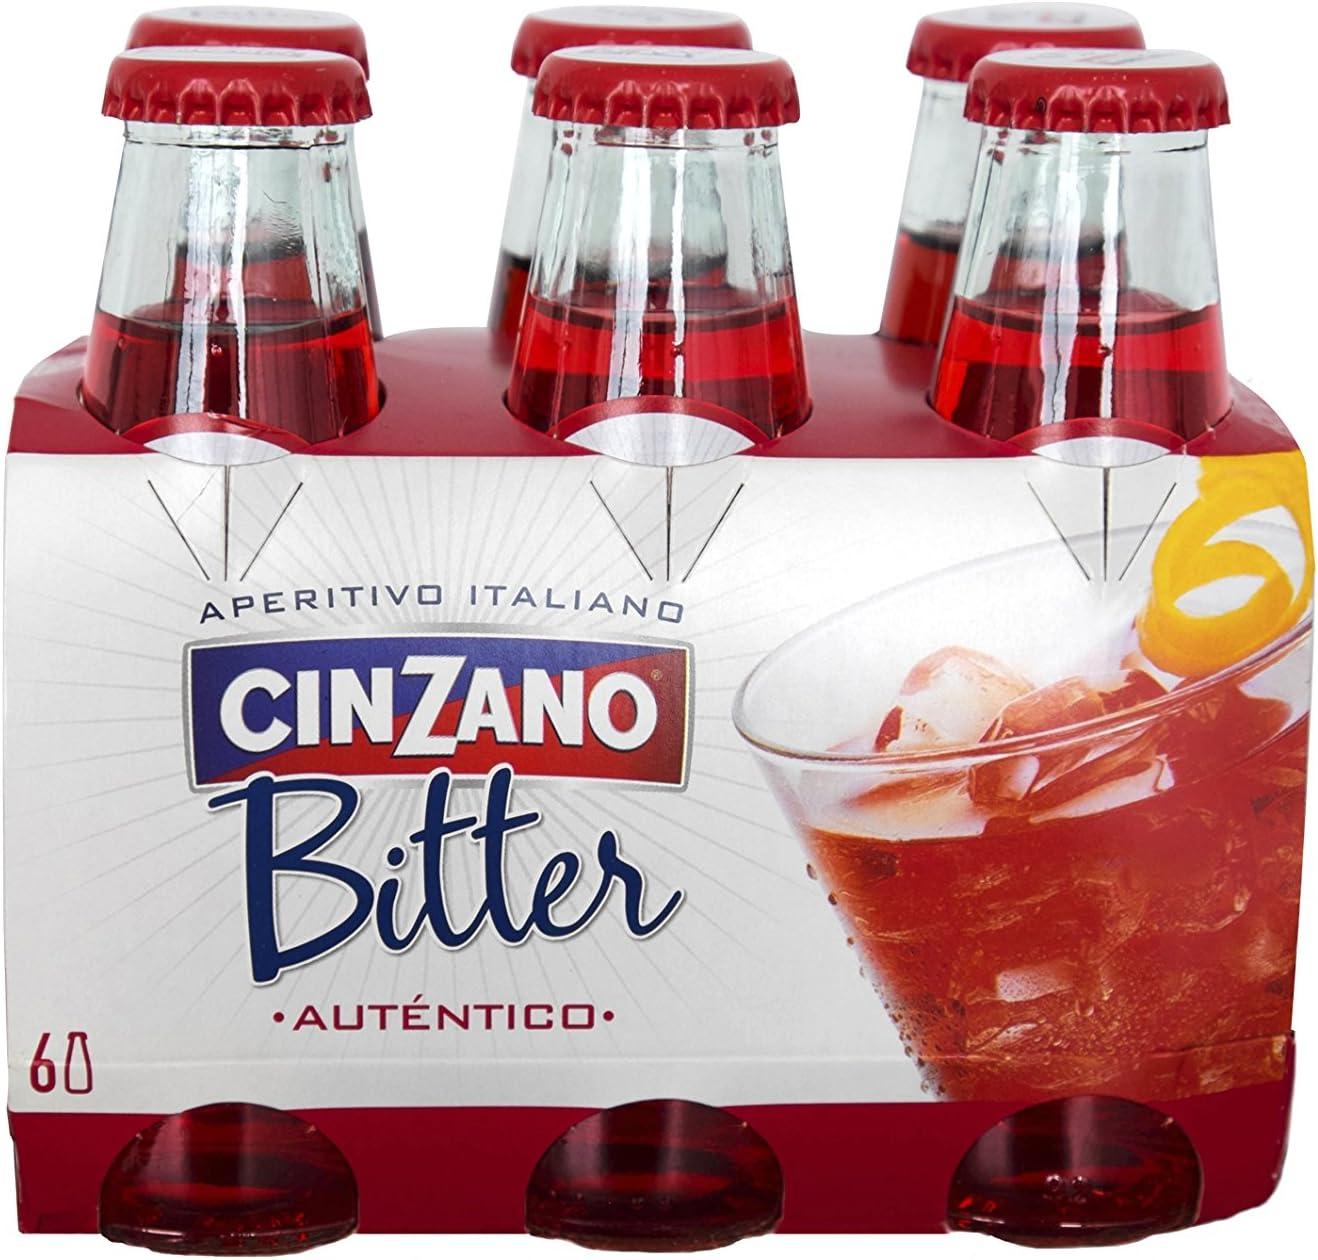 Cinzano Aperitivo Bitter Soda, 6 x 10cl